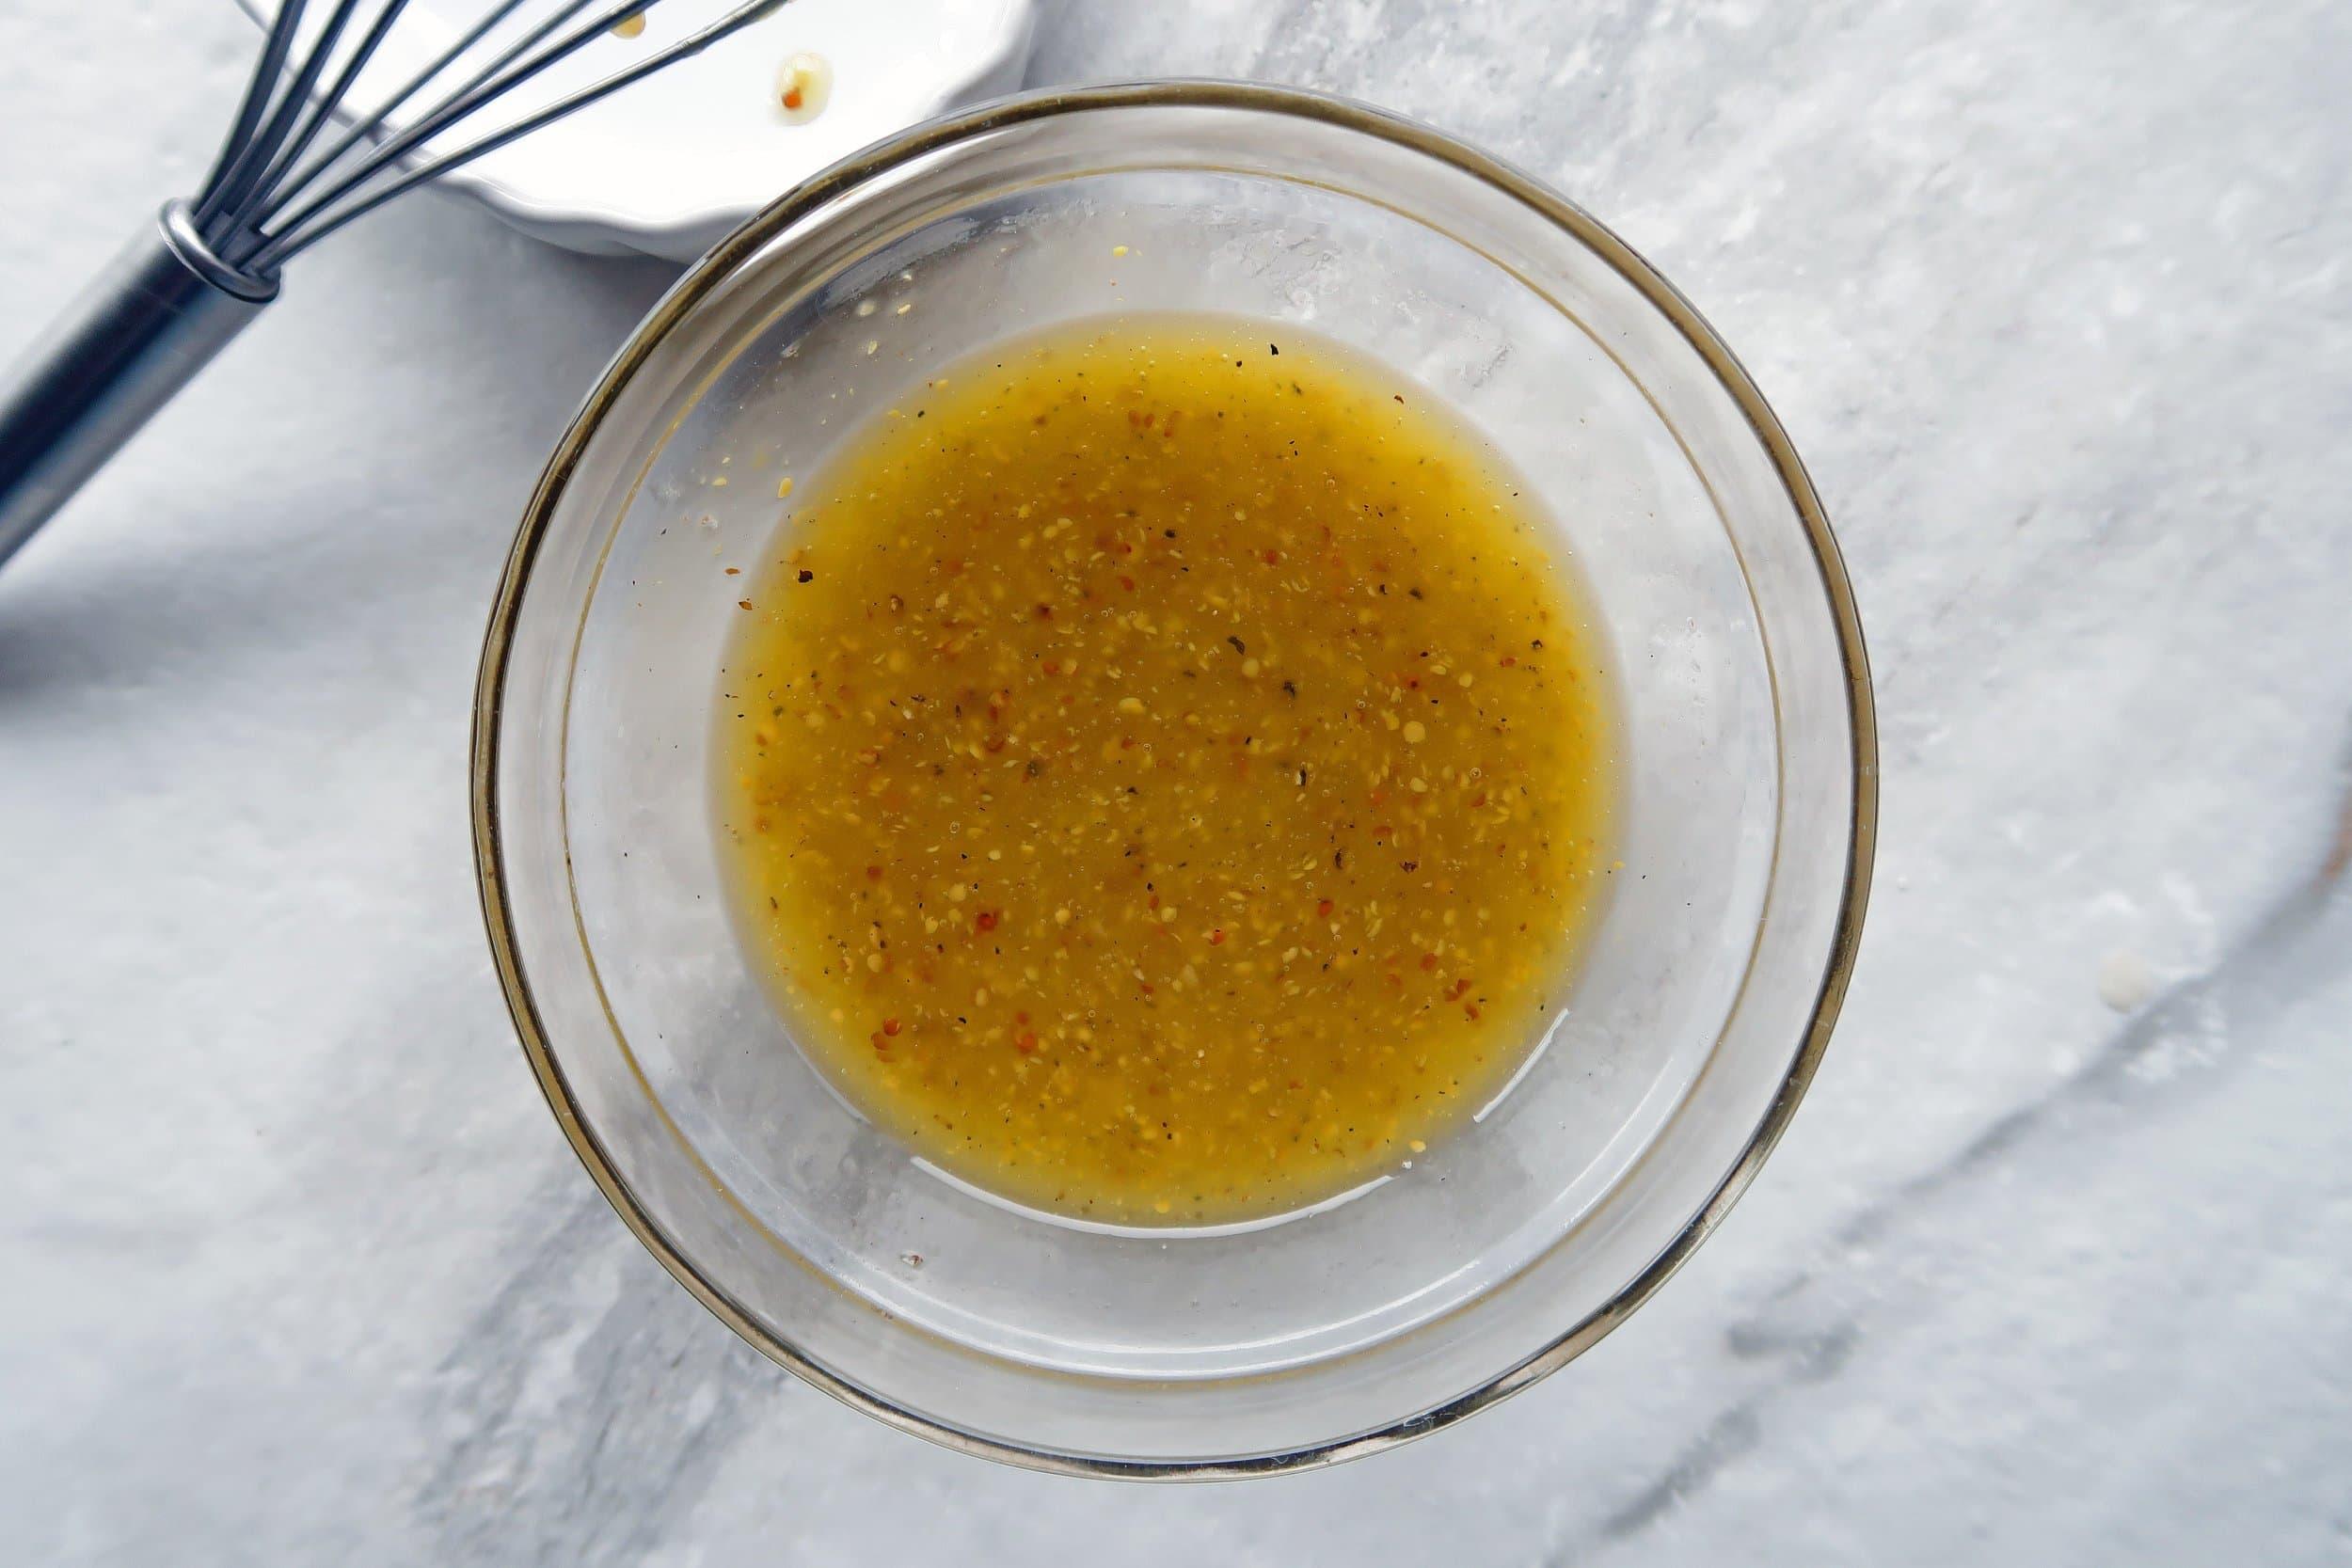 A bowl of apple cider vinaigrette.